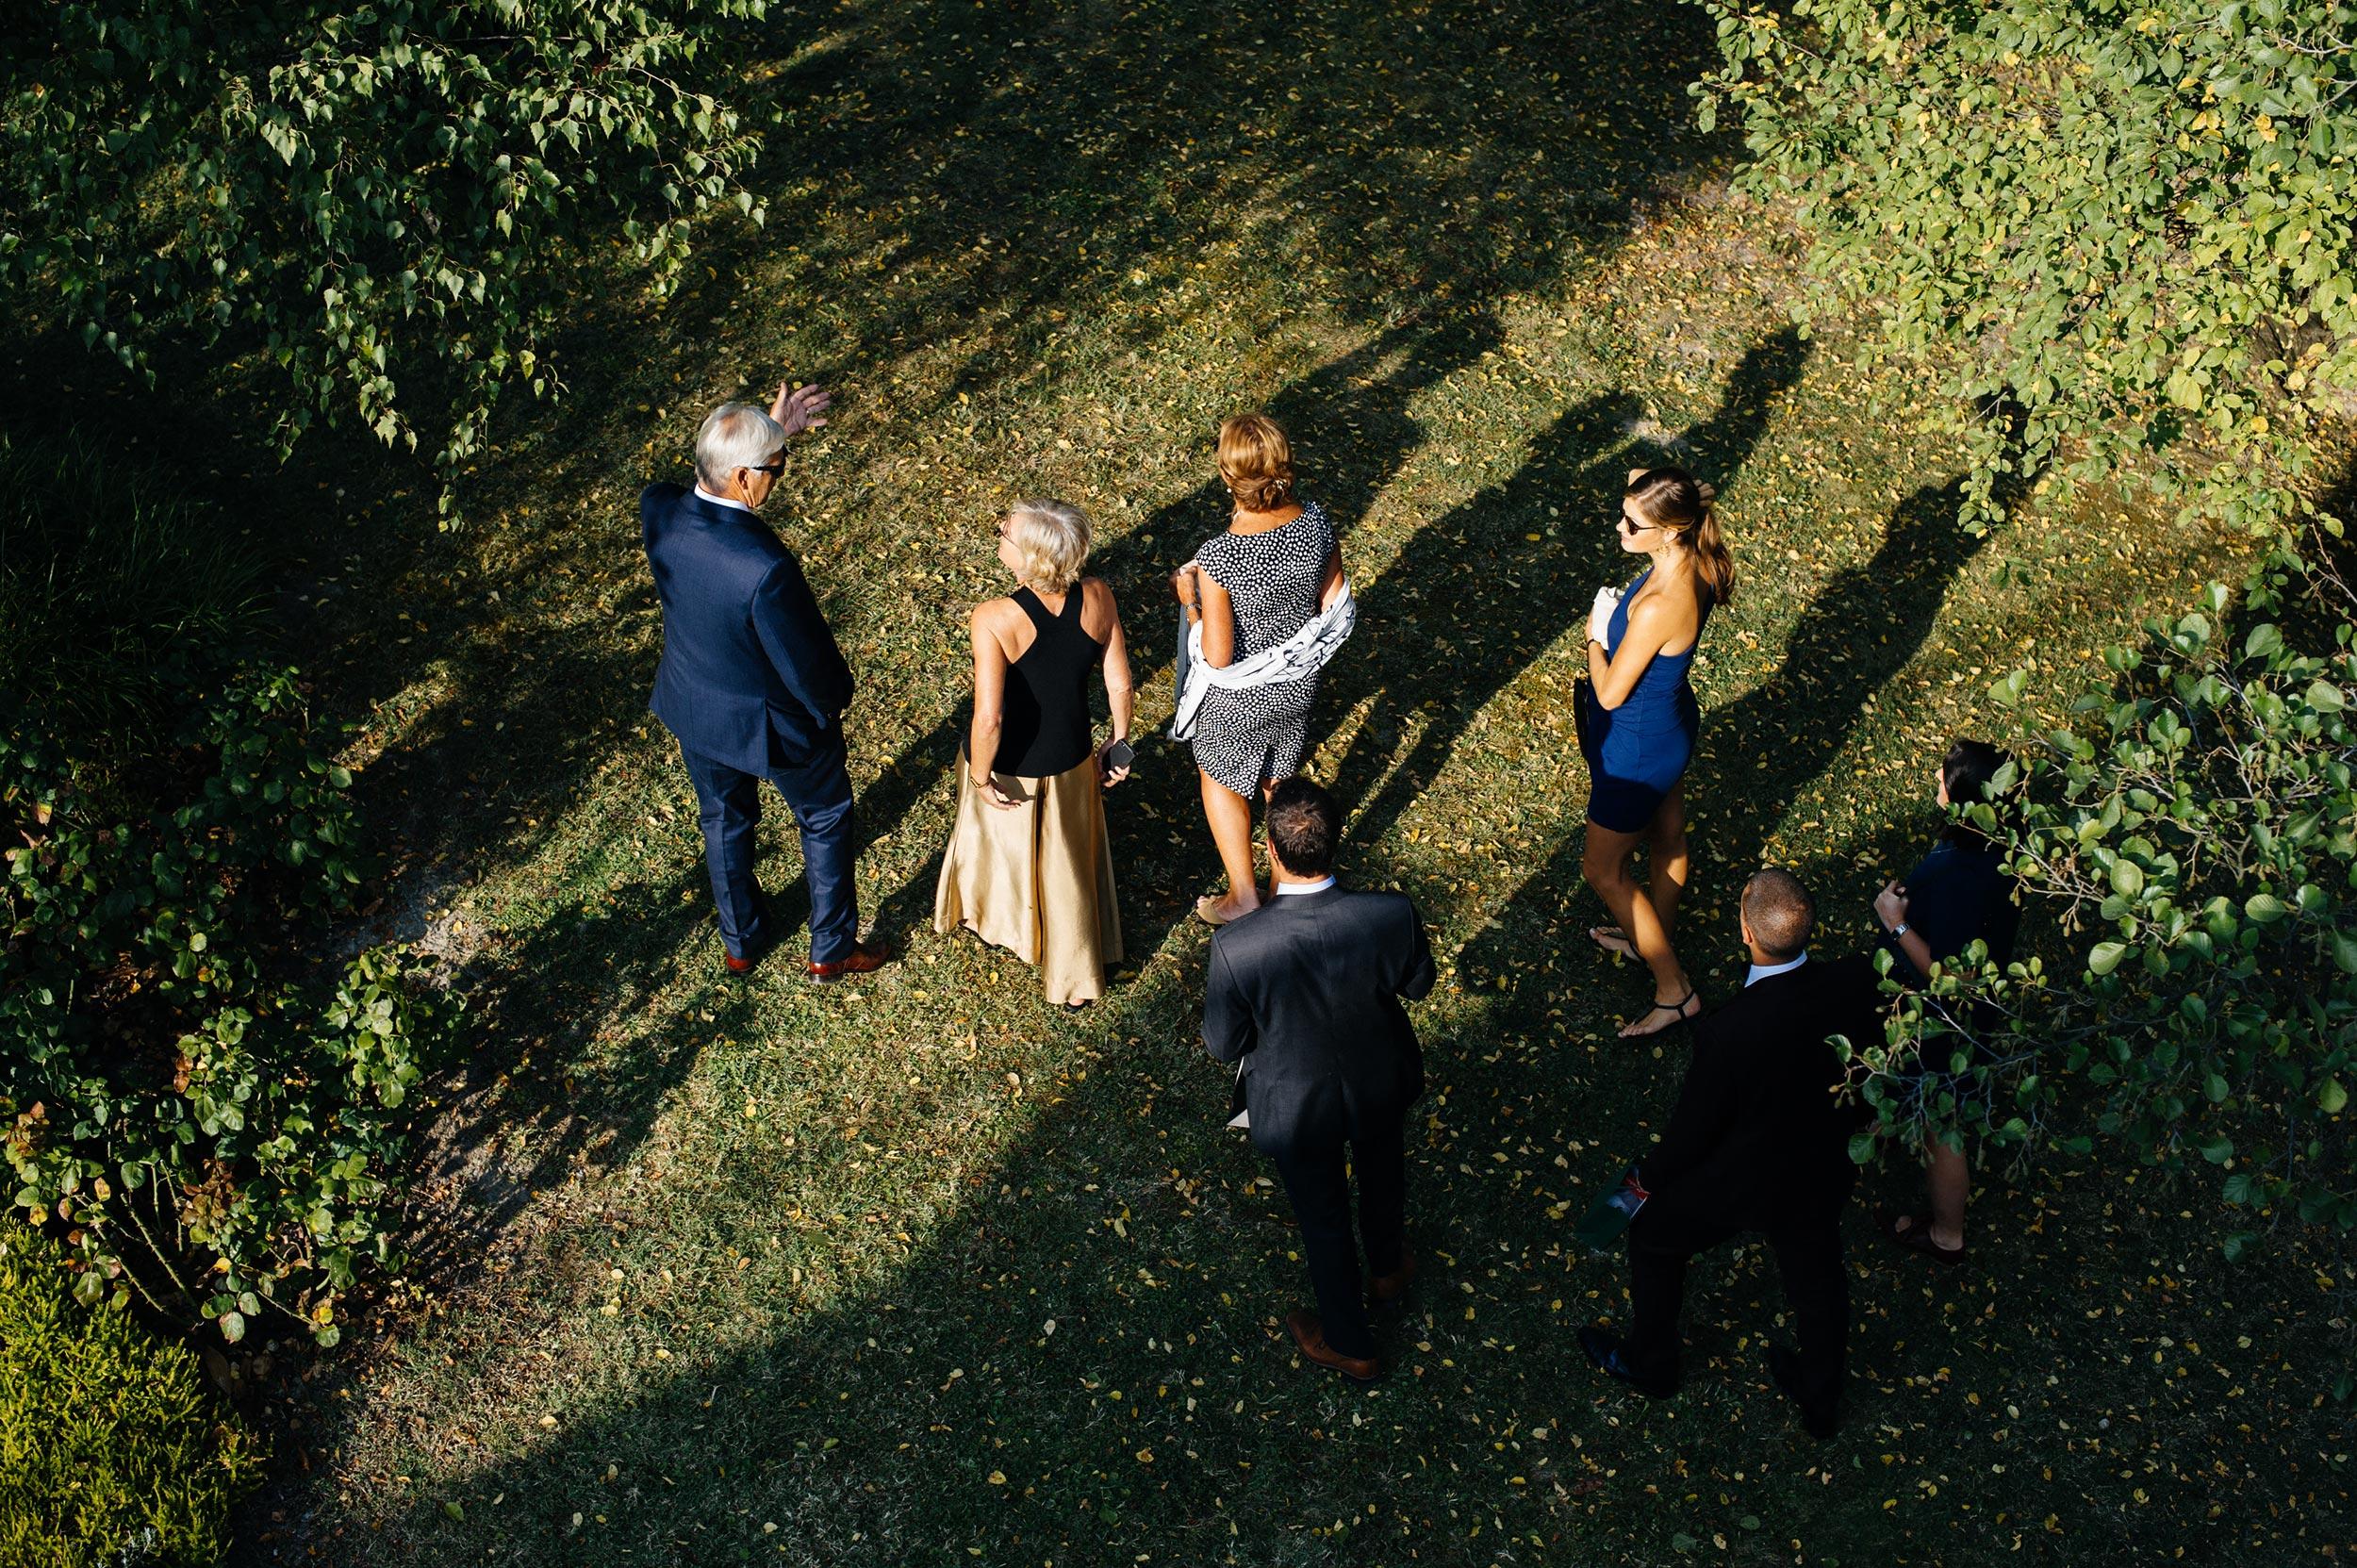 2016-Davor-Chiara-Monferrato-Asti-Vercelli-Wedding-Photographer-Italy-Alessandro-Avenali-16.jpg